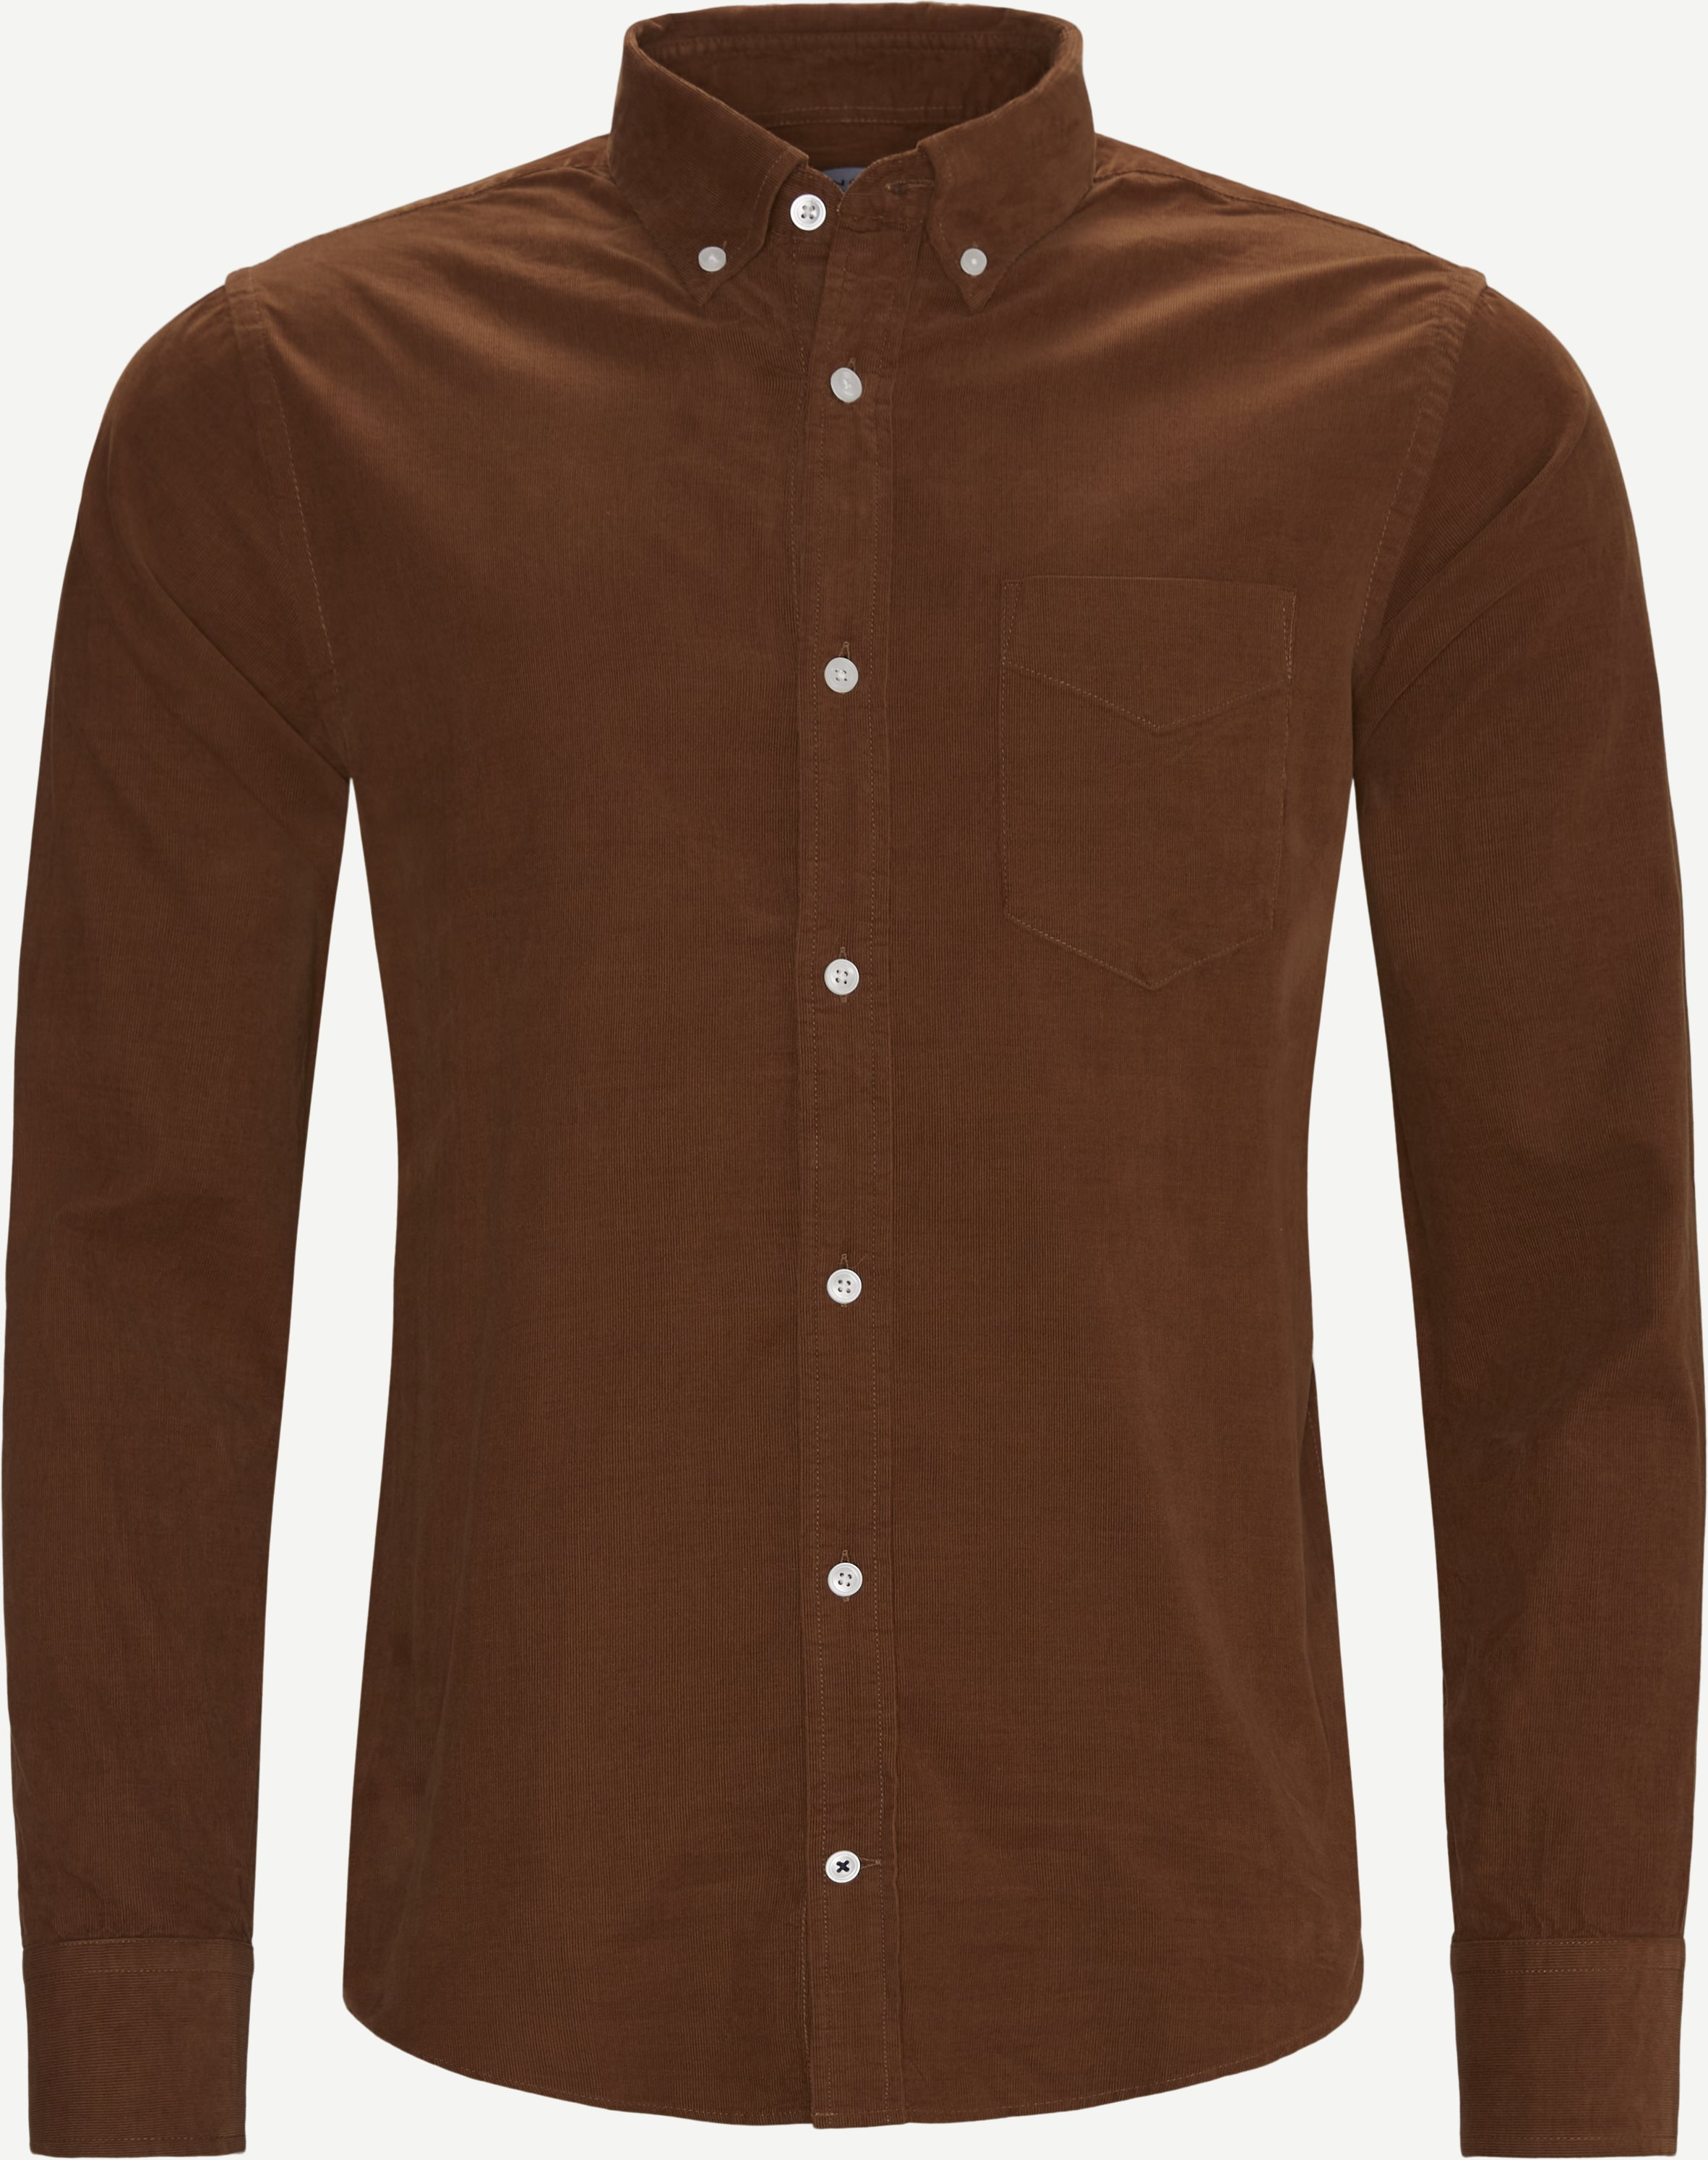 Skjortor - Regular - Brun